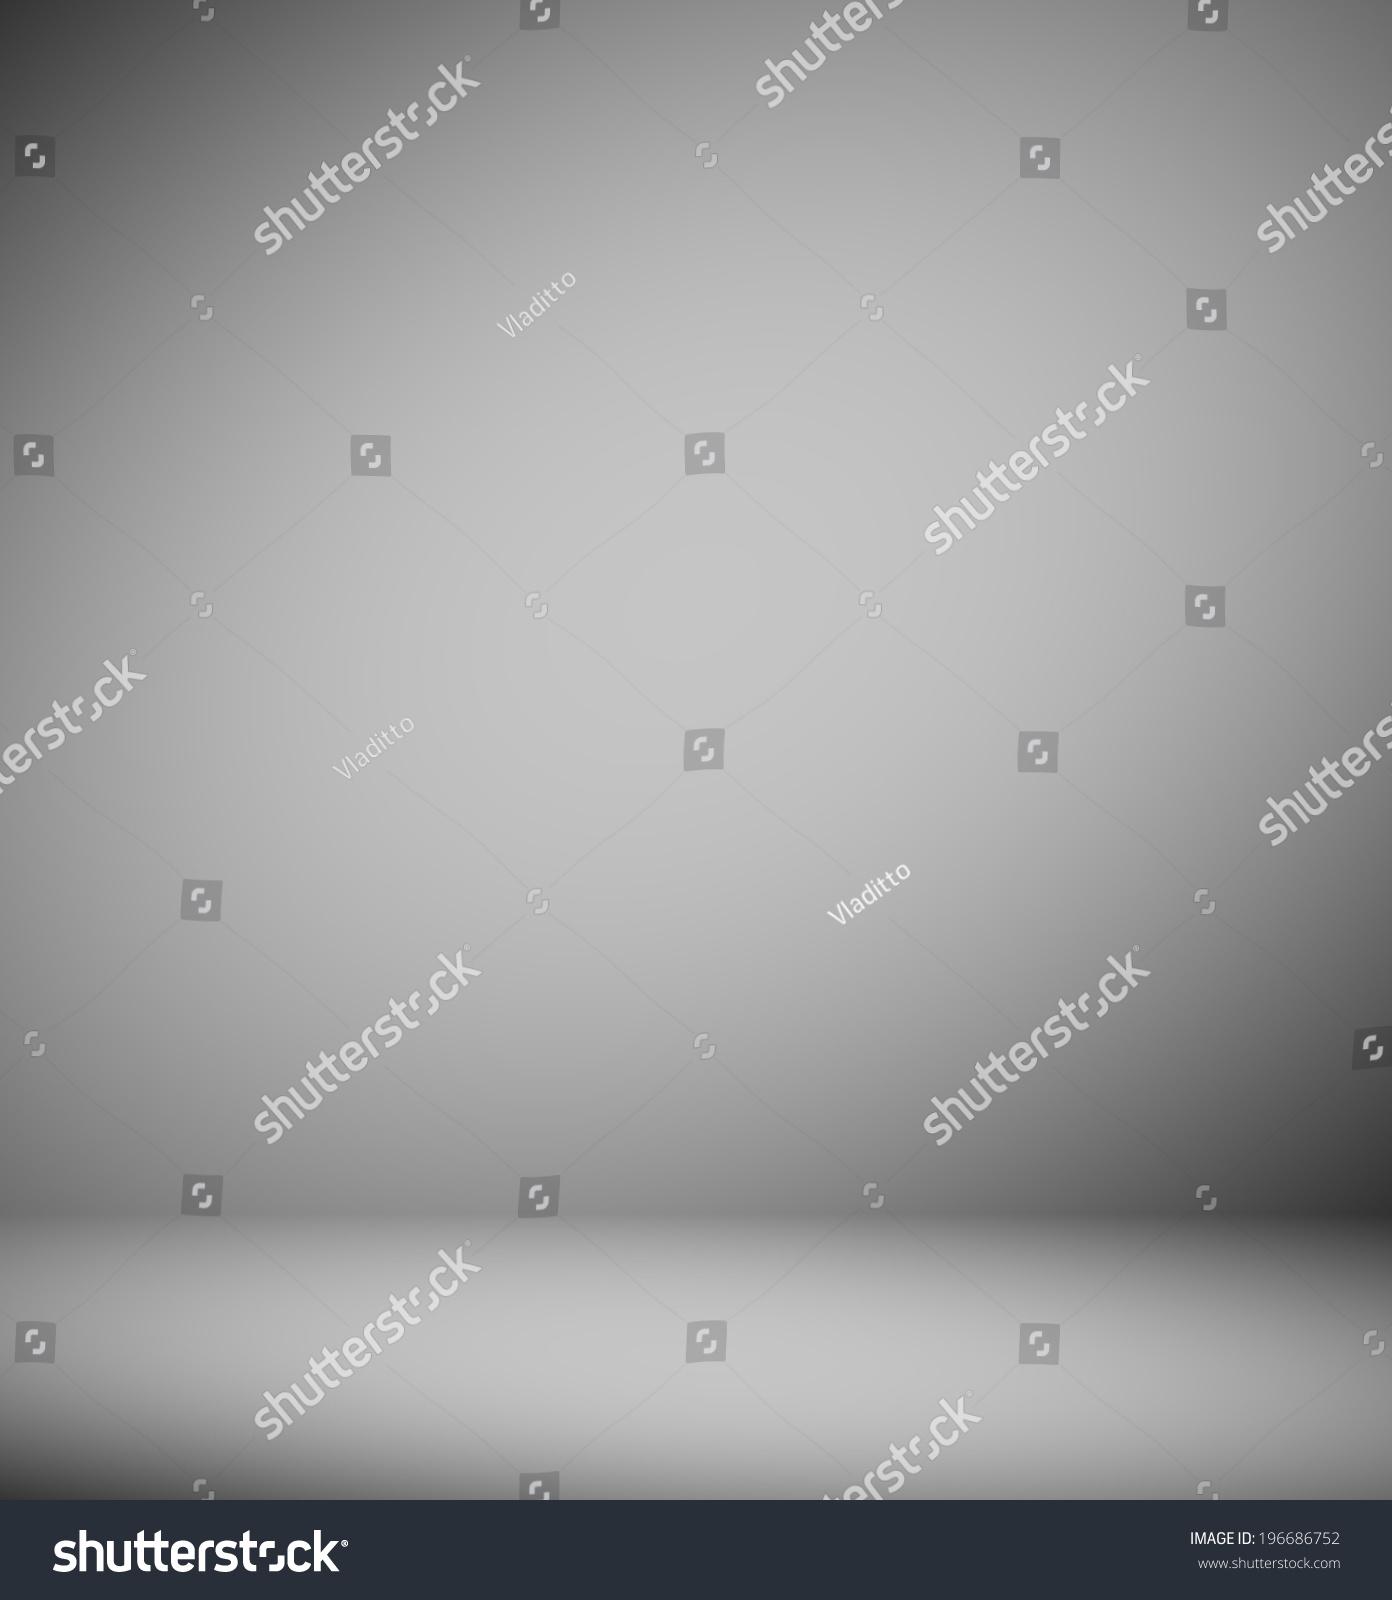 Abstract Illustration Background Texture Light Gray Stock